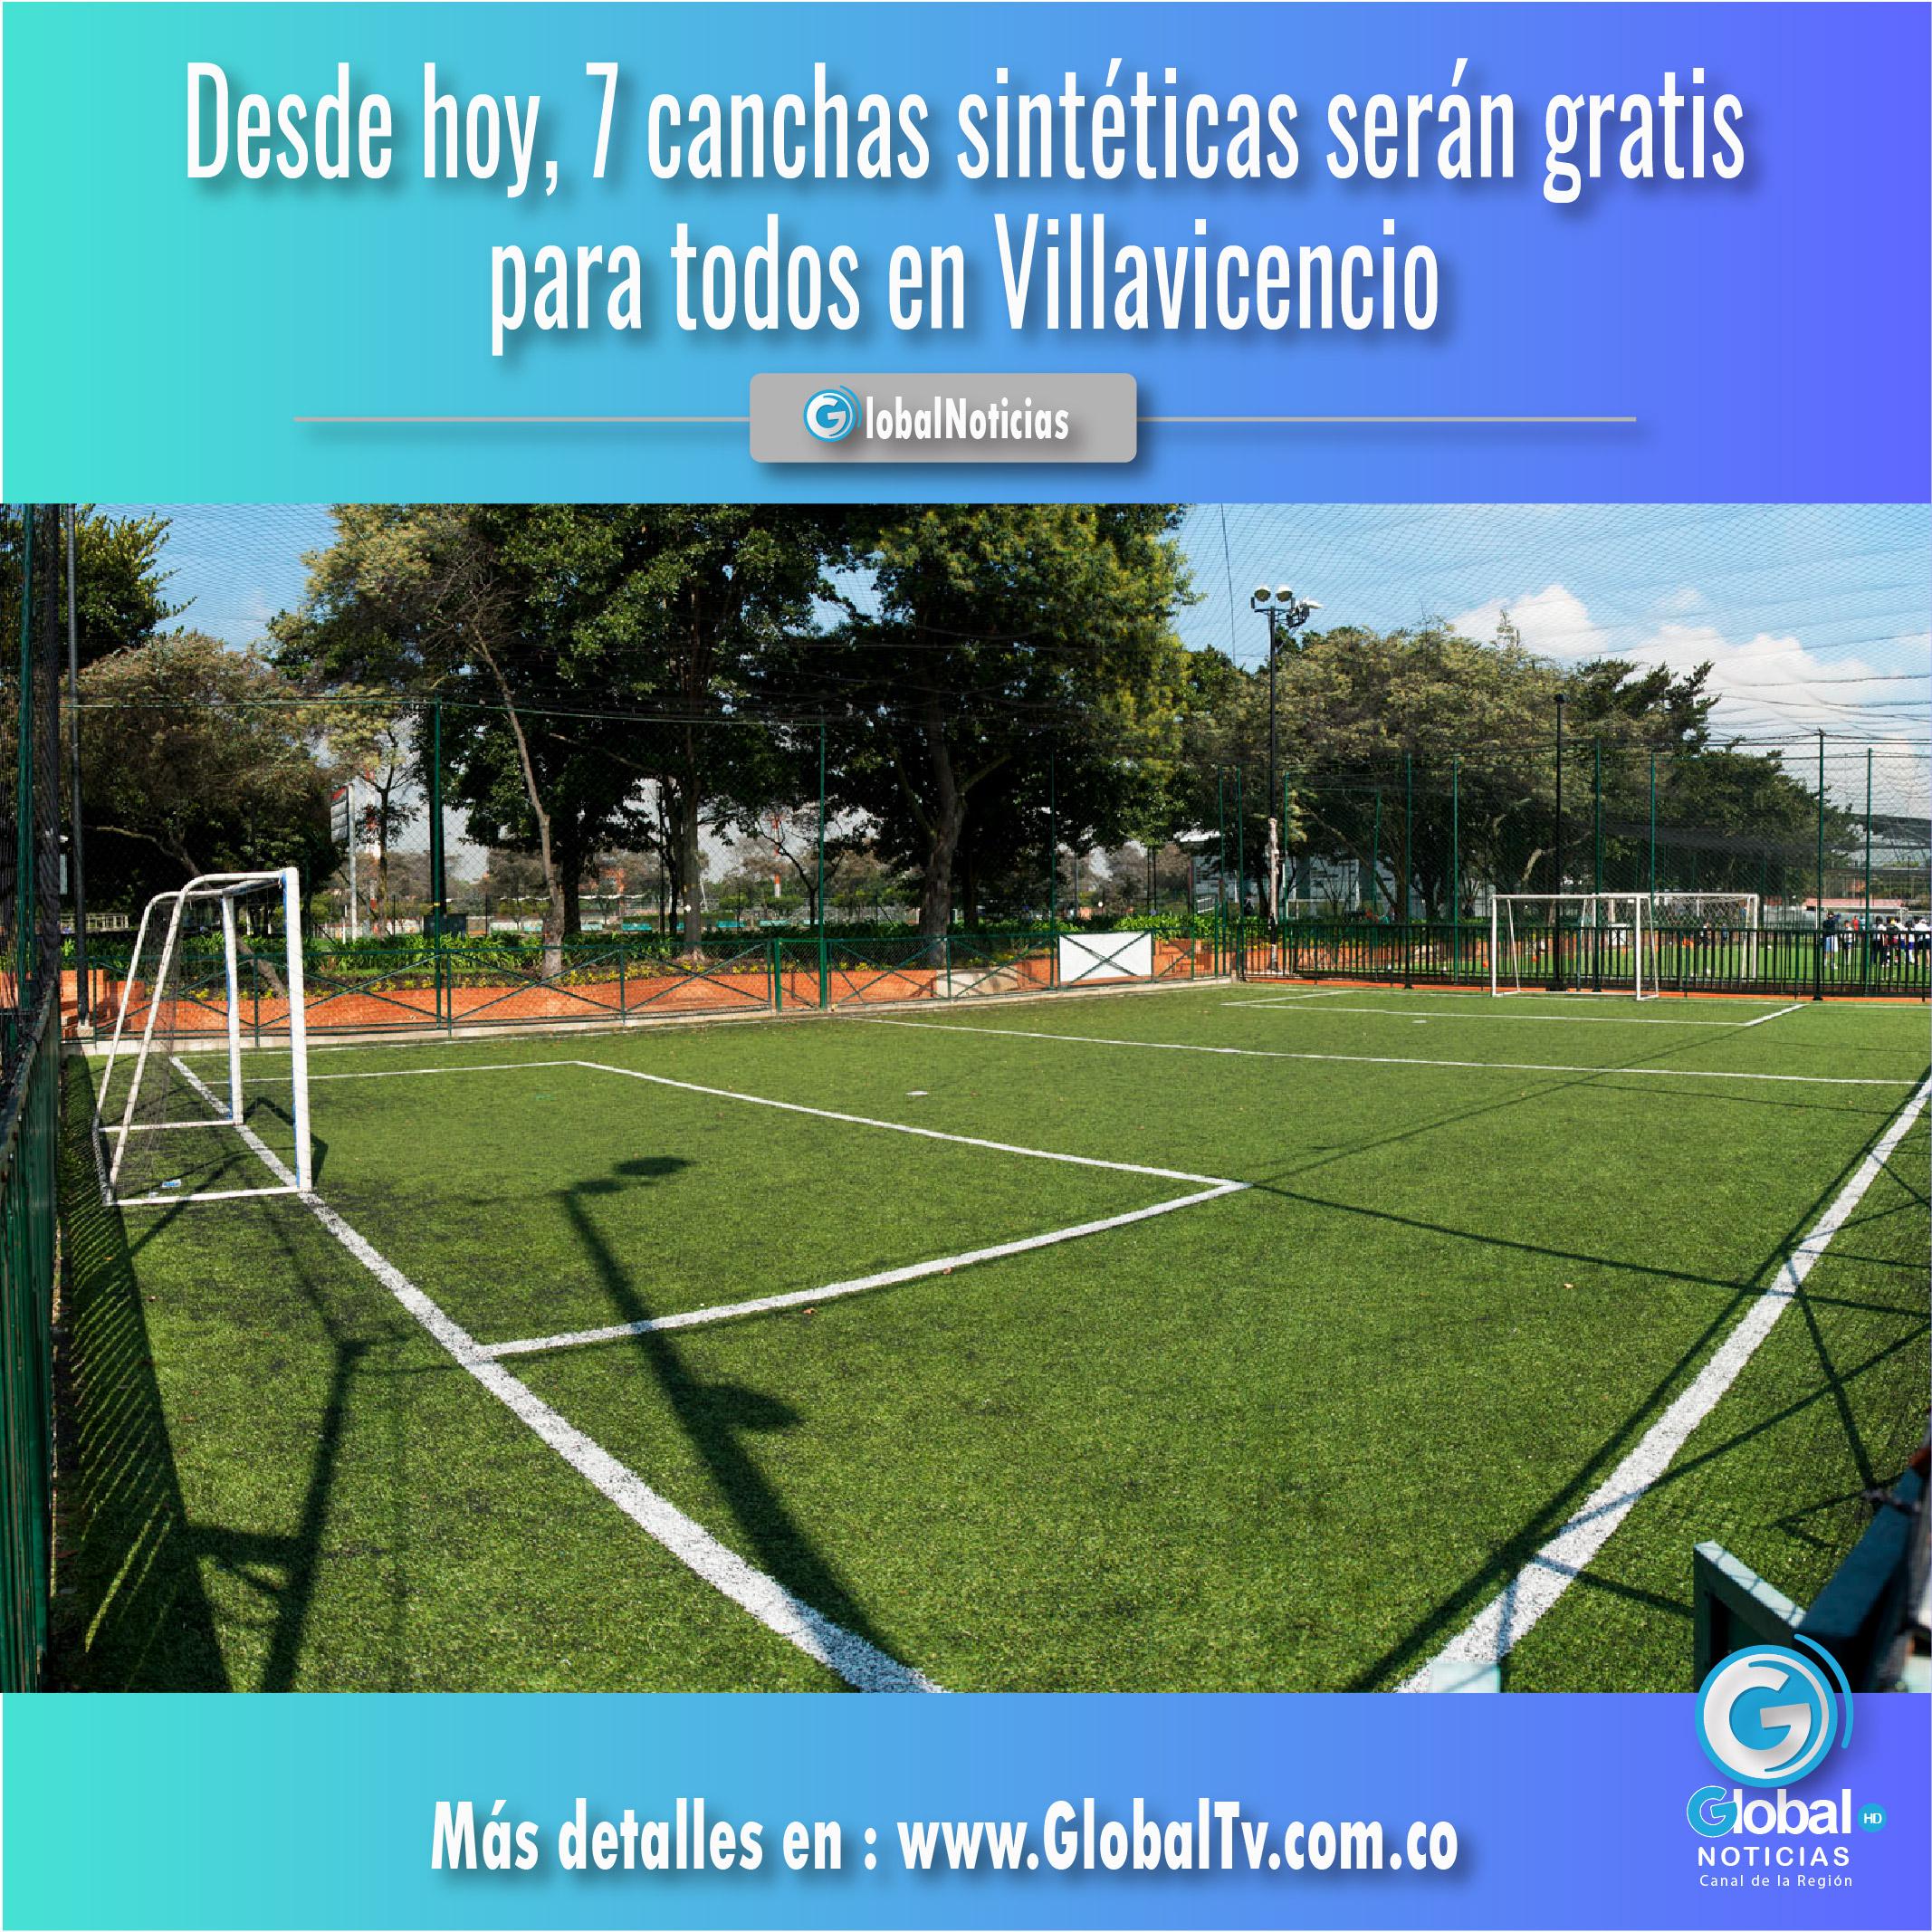 Desde hoy, 7 canchas sintéticas serán gratis para todos en Villavicencio